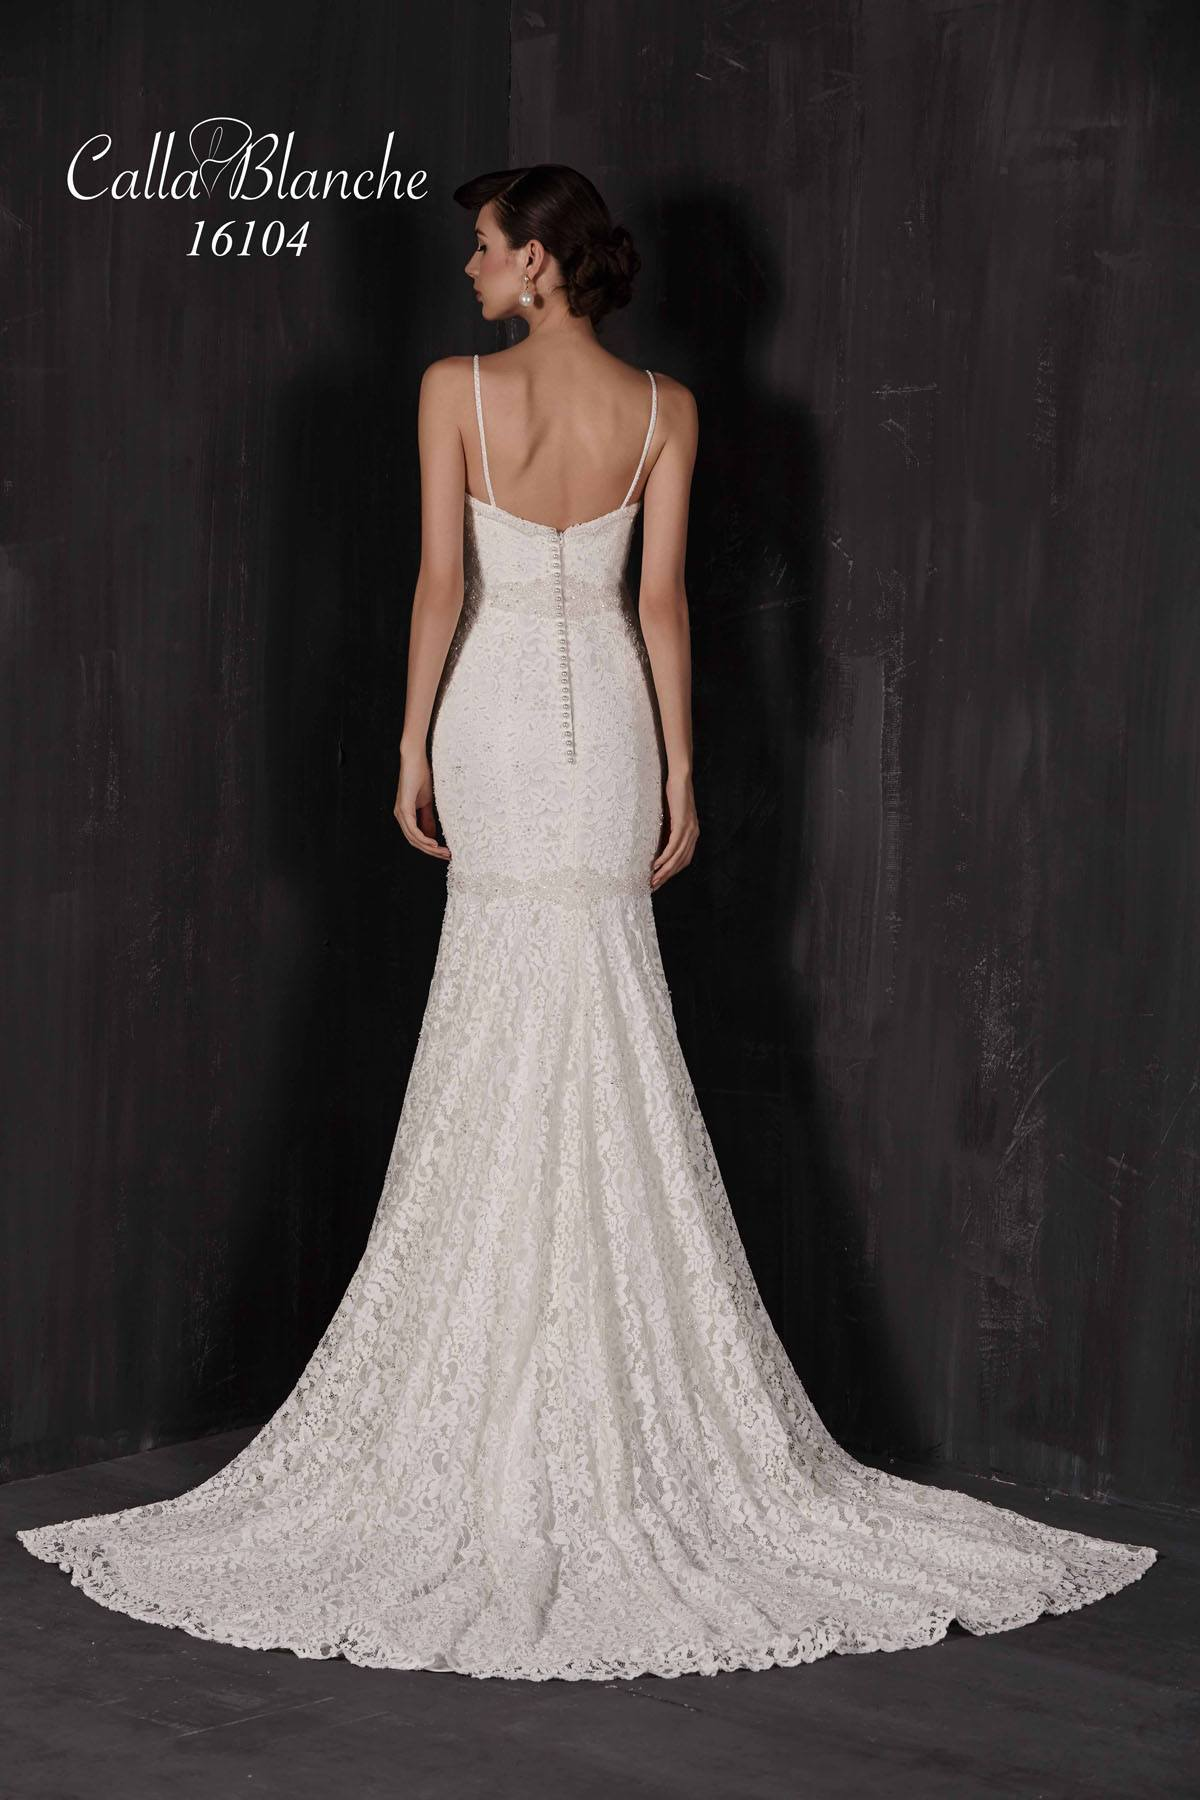 Calla blanche bridal gowns for Unique wedding dresses toronto